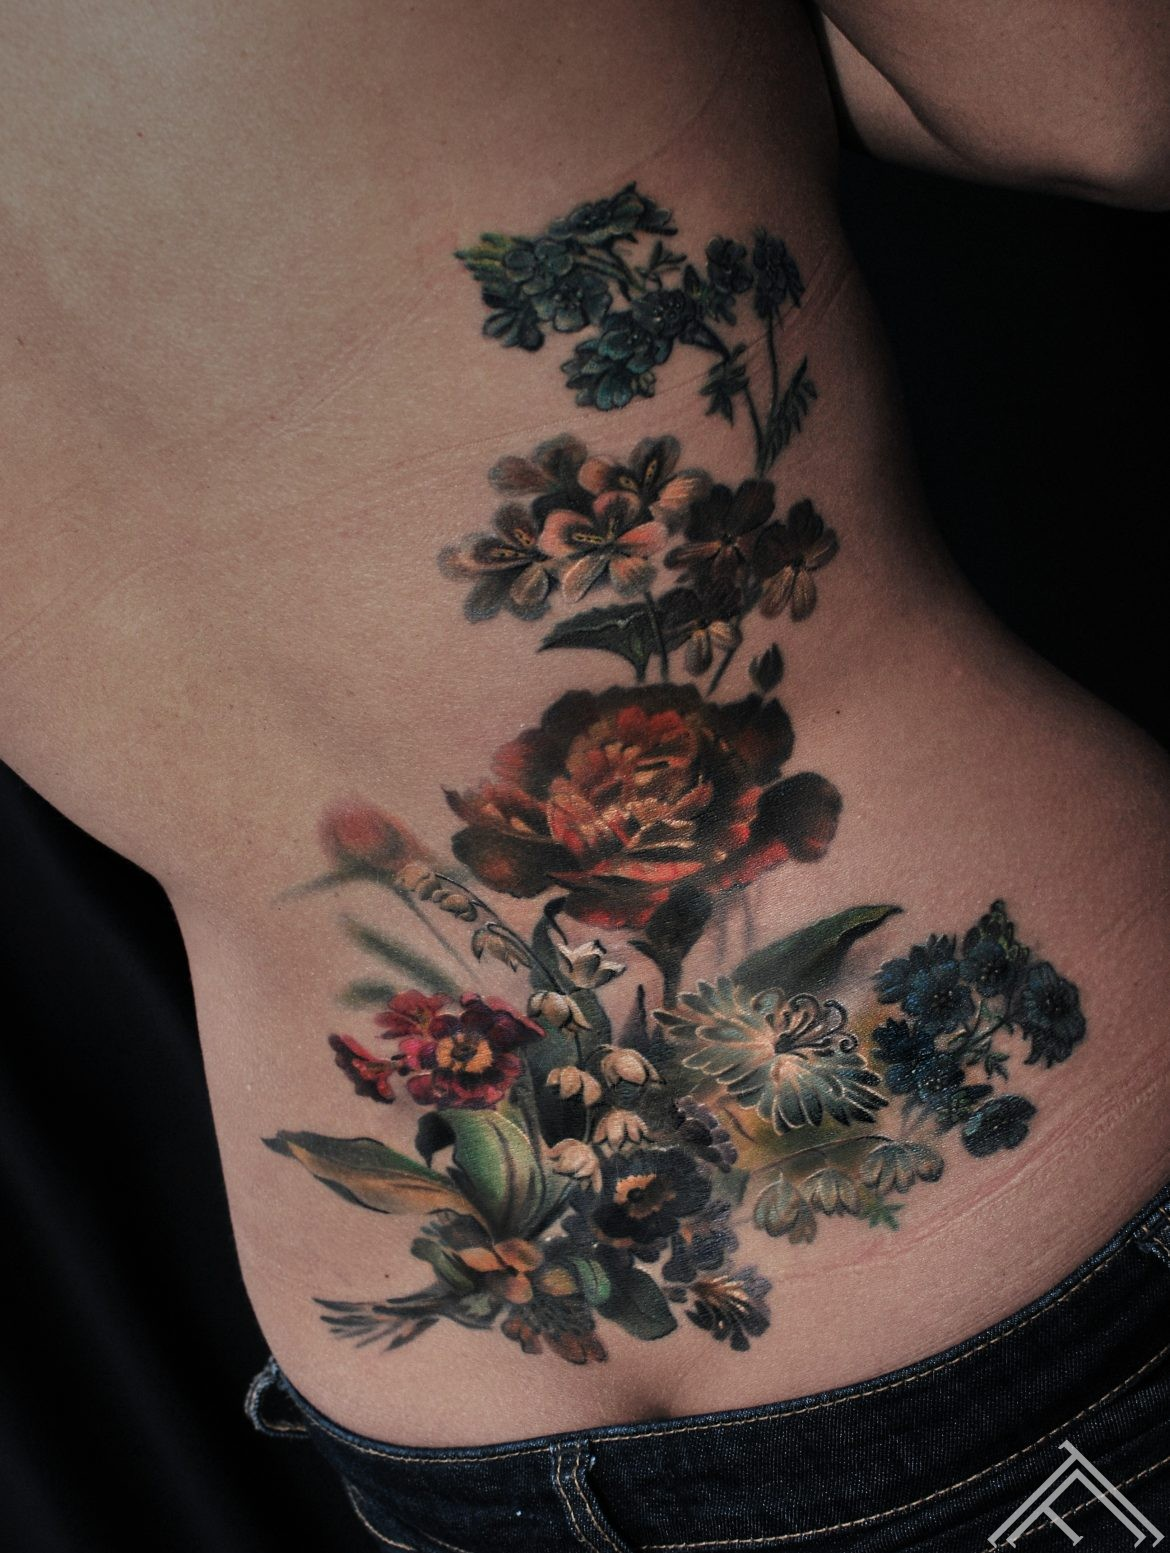 vintage-flowers-ziedi-tattoo-tetovejums-art-maksla-riga-tattoofrequency-studija-marispavlo